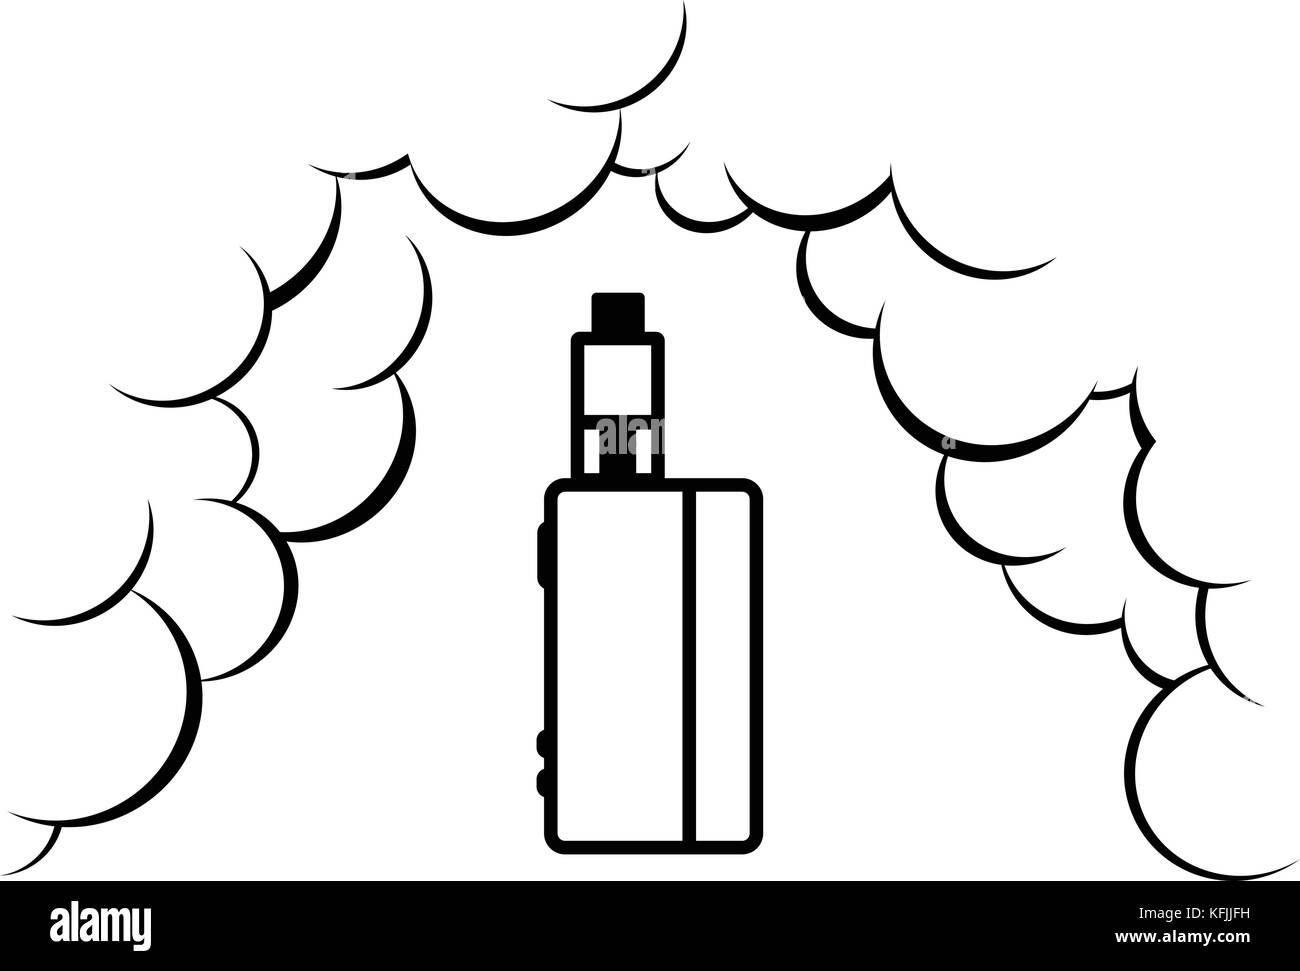 vaporizer electric cigarette vapor mod - vape life vector - Stock Image